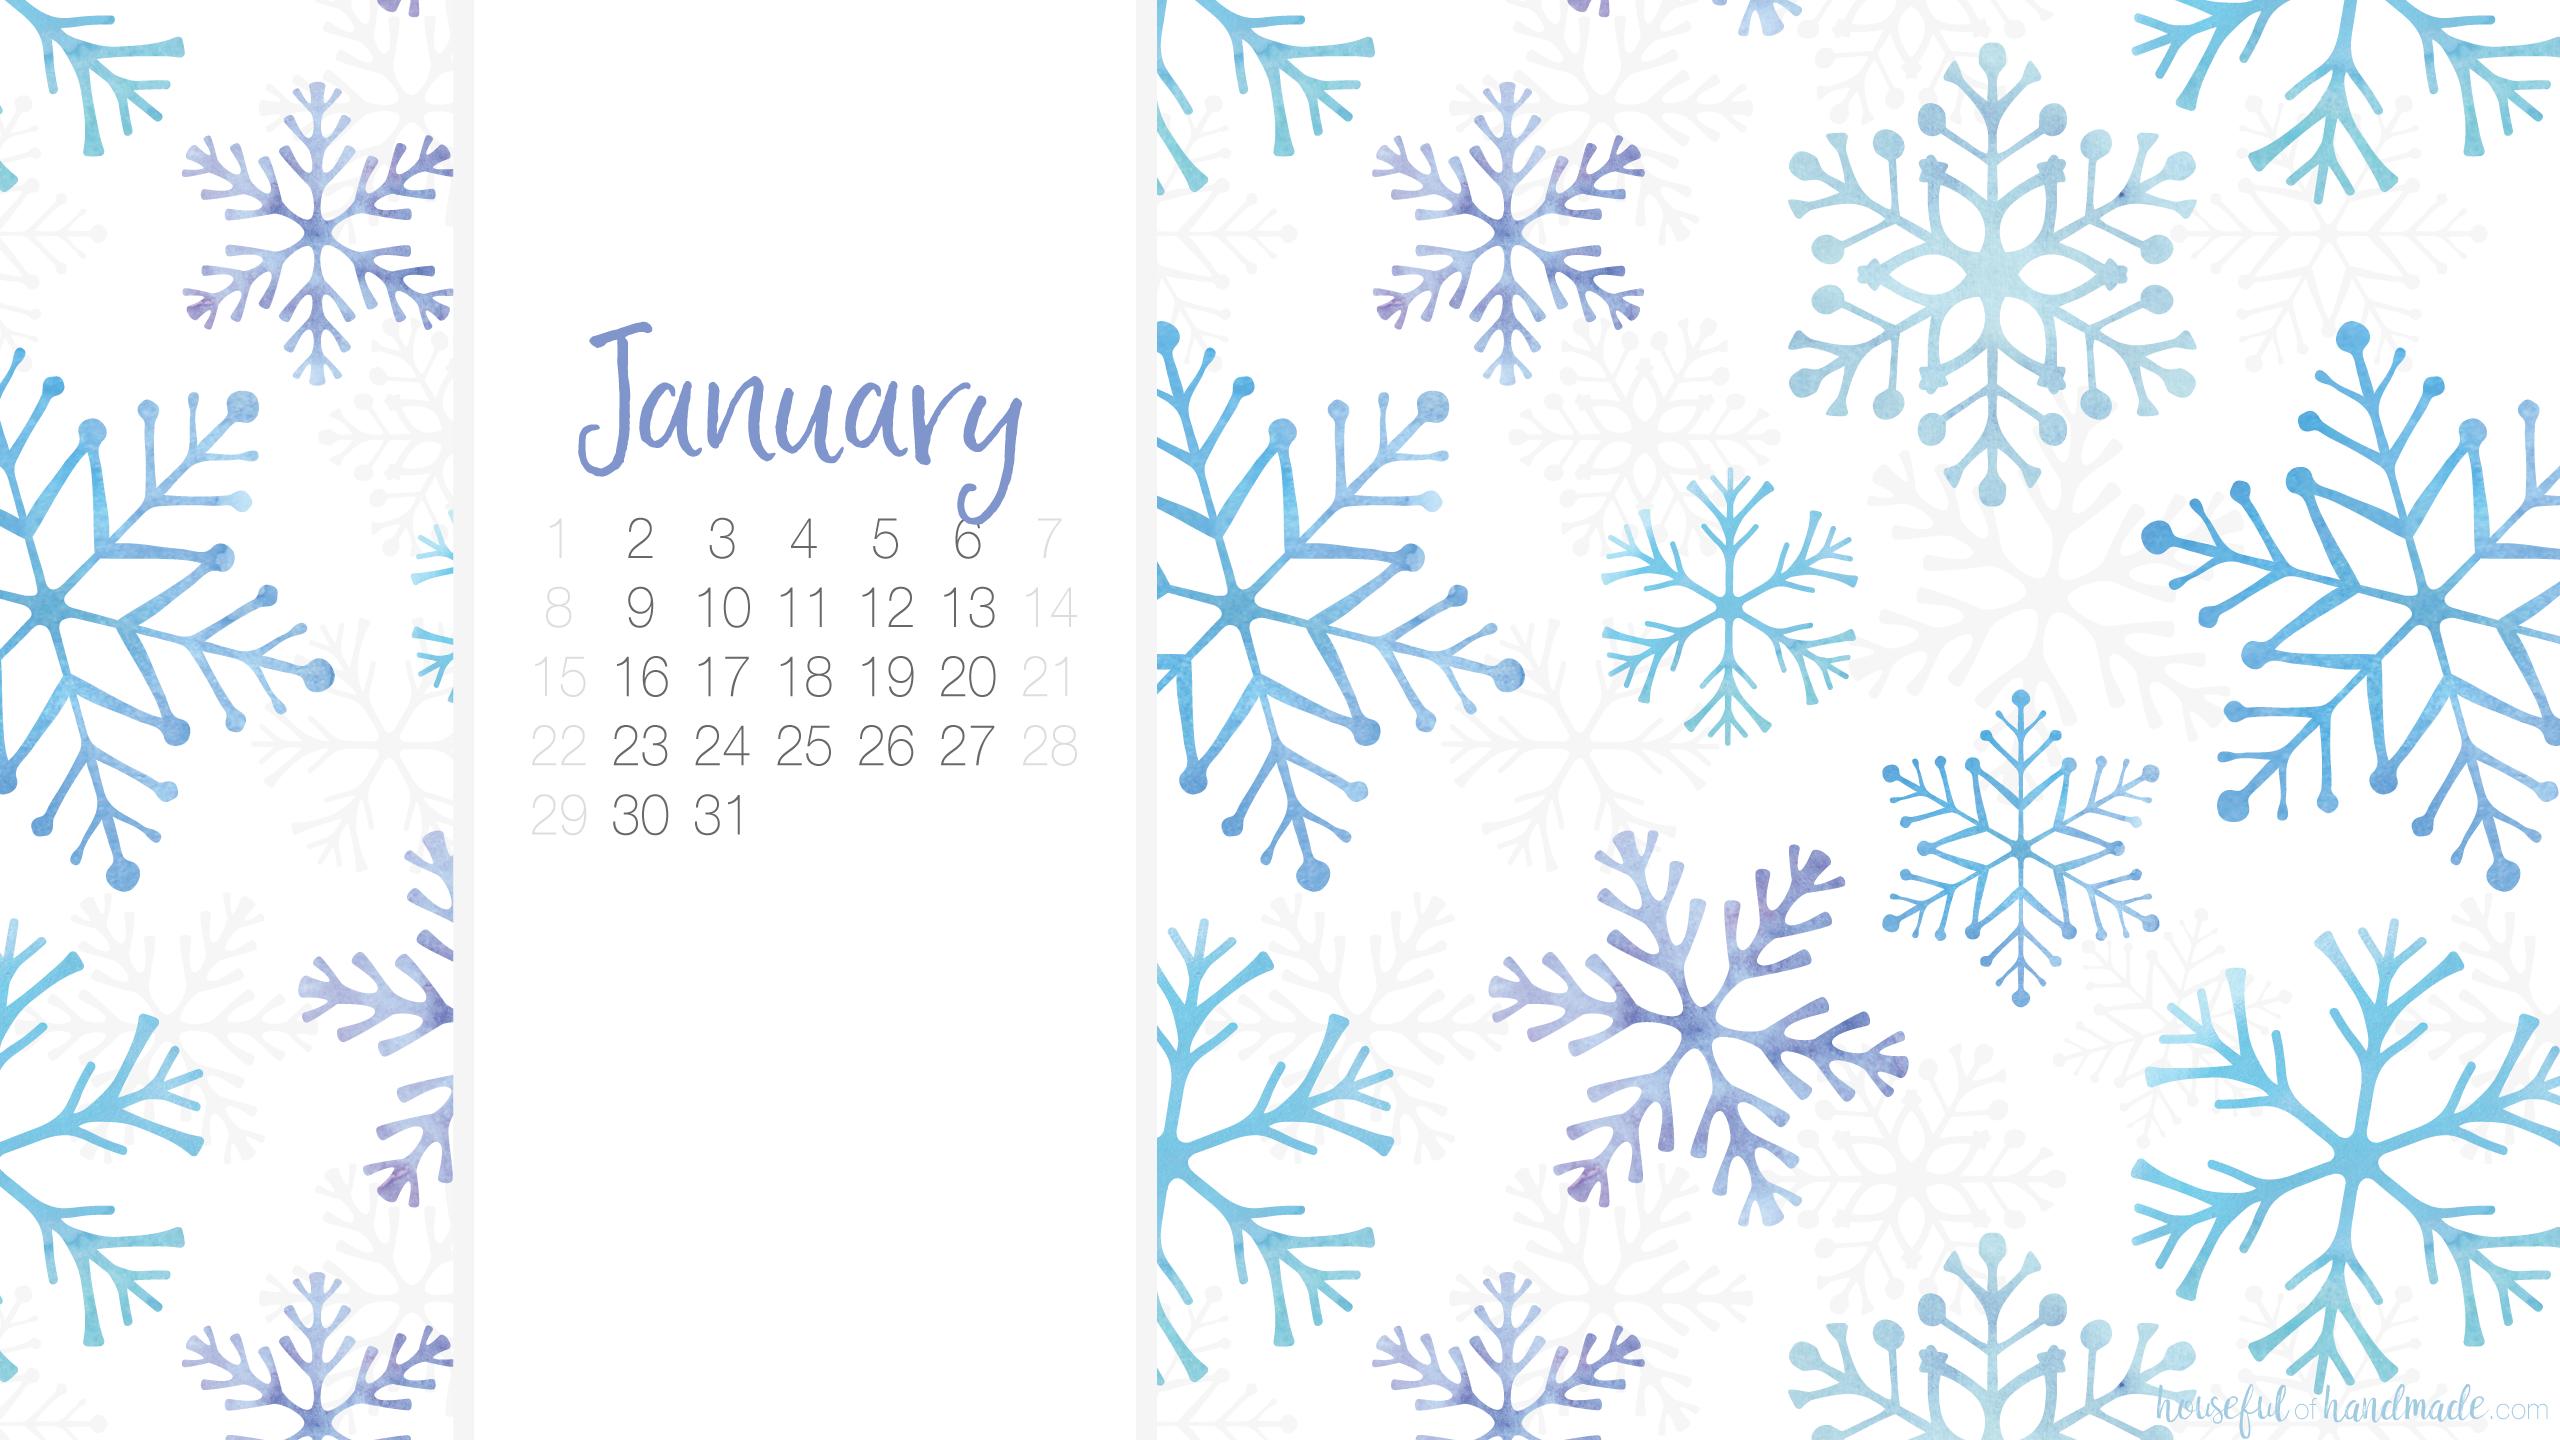 January 2018 Calendar Background 2560x1440